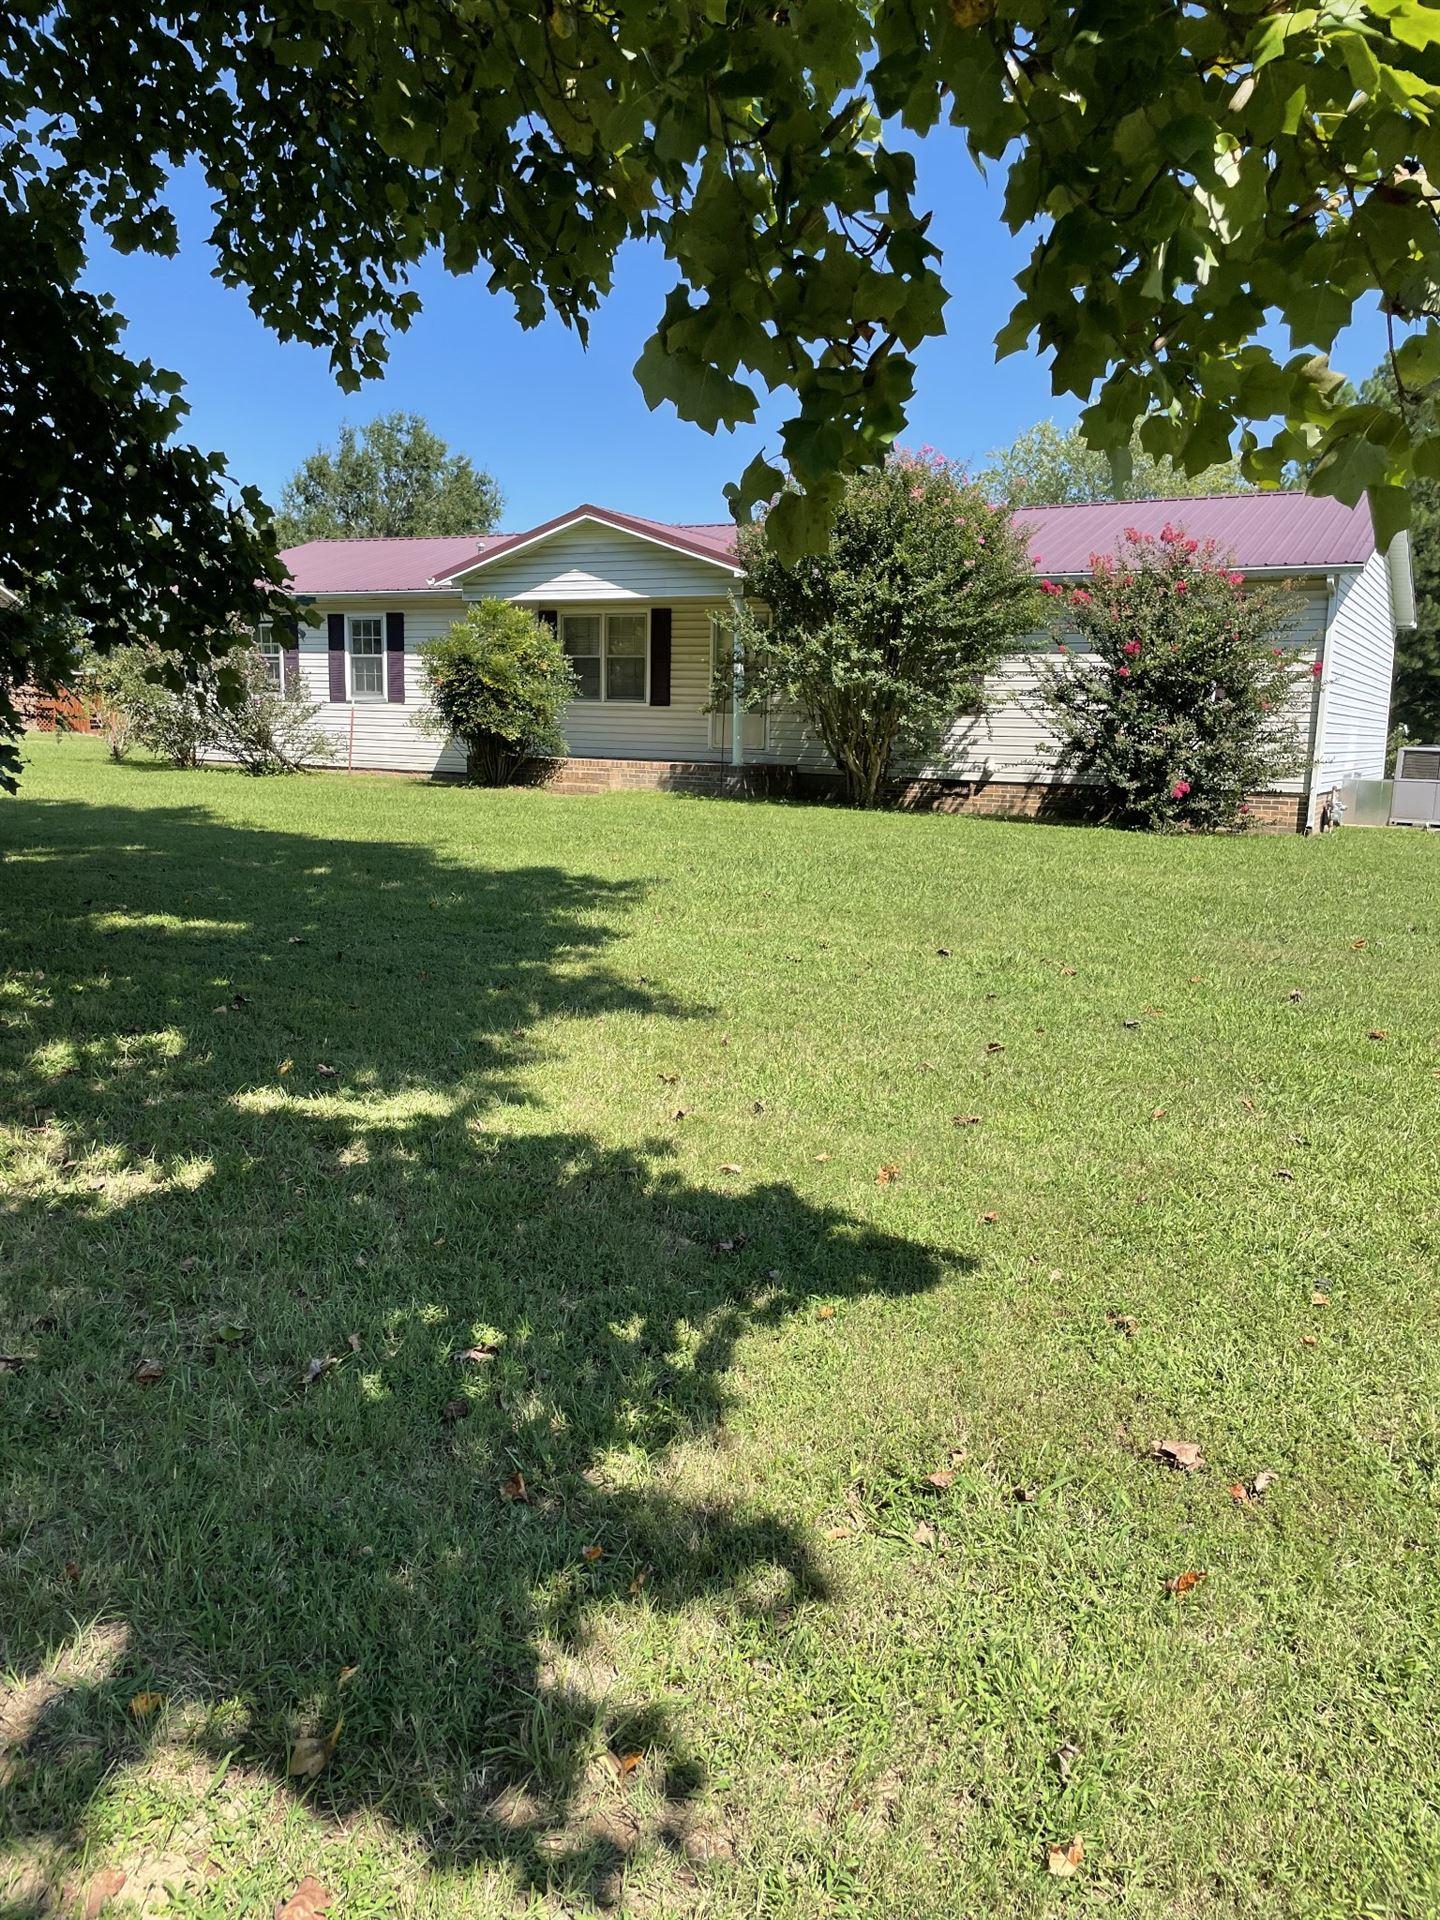 2 Clayton Acres Rd, Fayetteville, TN 37334 - MLS#: 2287868